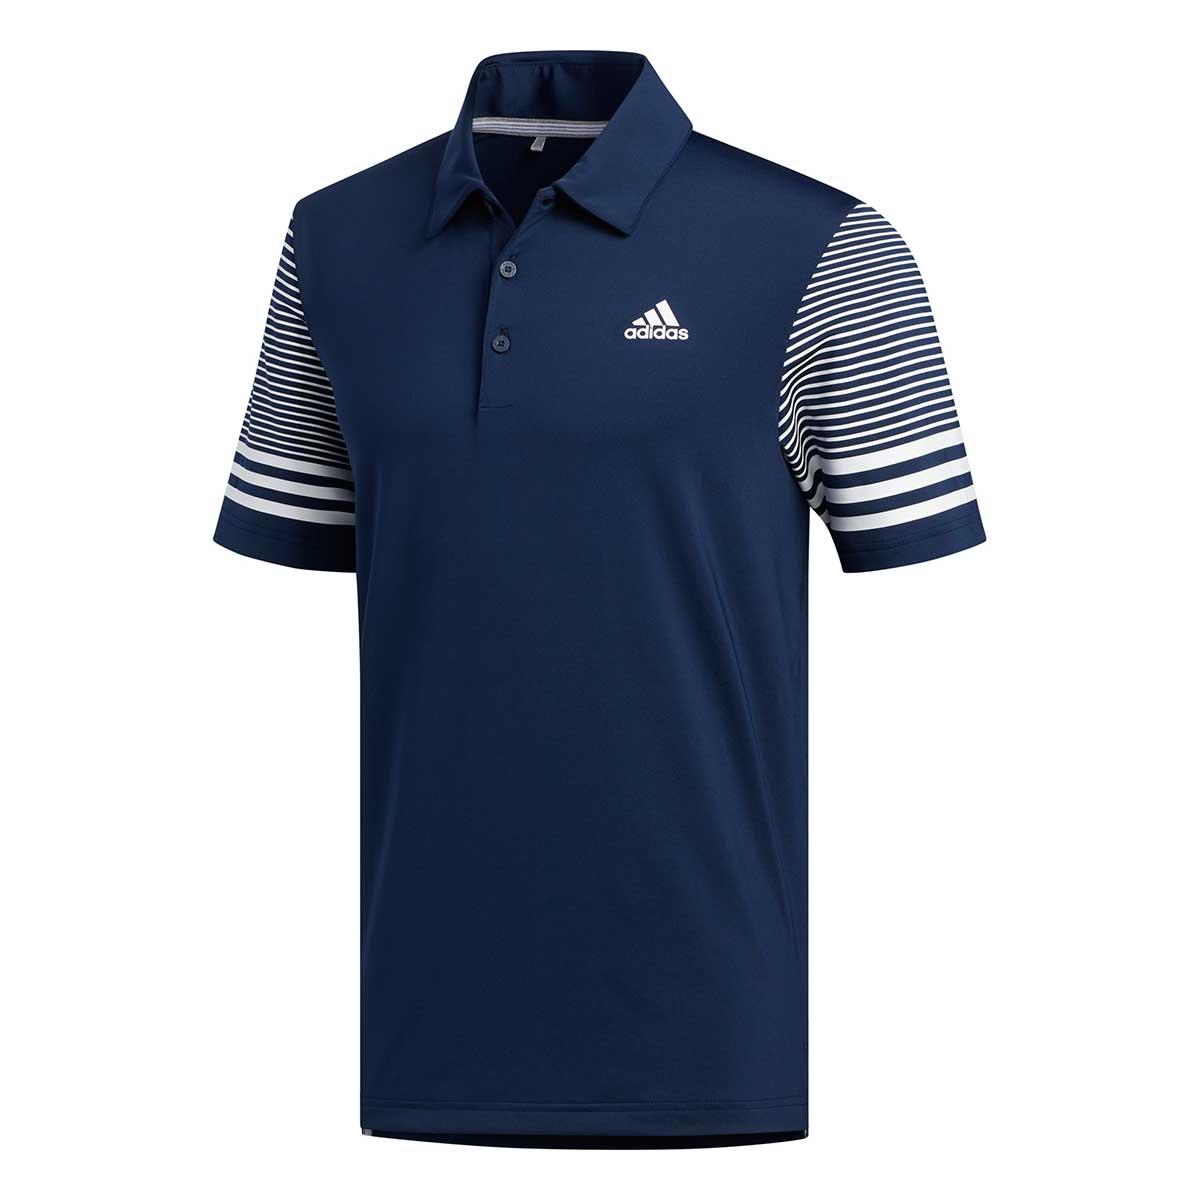 Adidas Men's Ultimate365 Gradient Collegiate Navy Polo